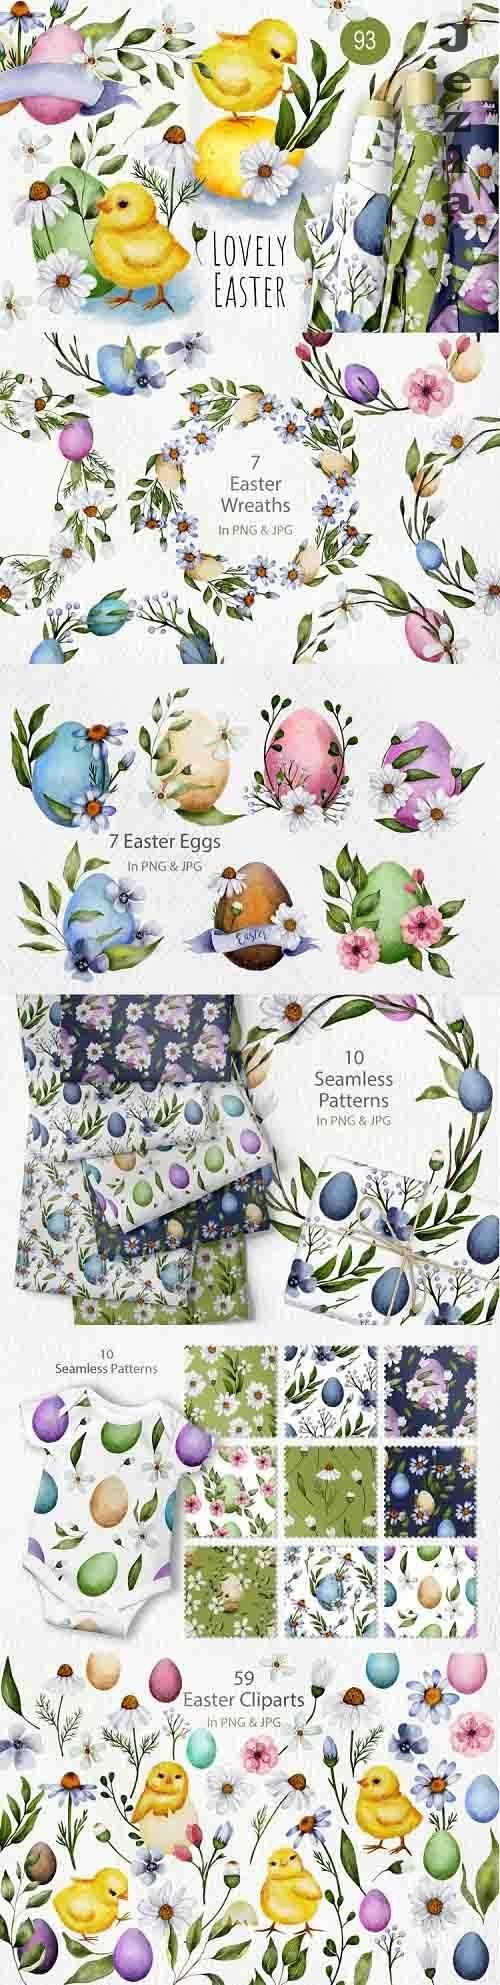 Easter Watercolor Chicken Bundle - 1237683